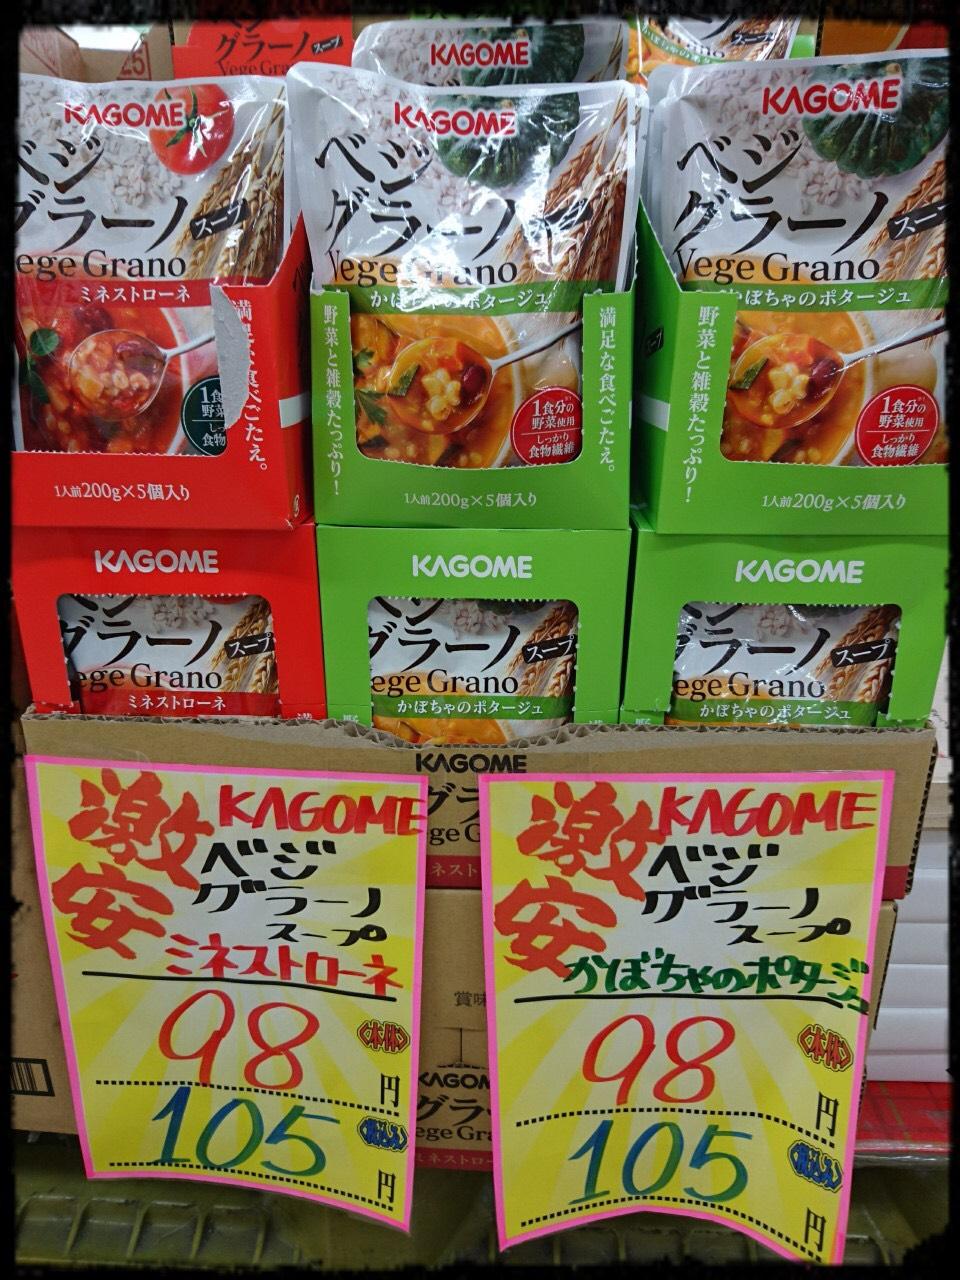 KAGOME ベジラーノ各種